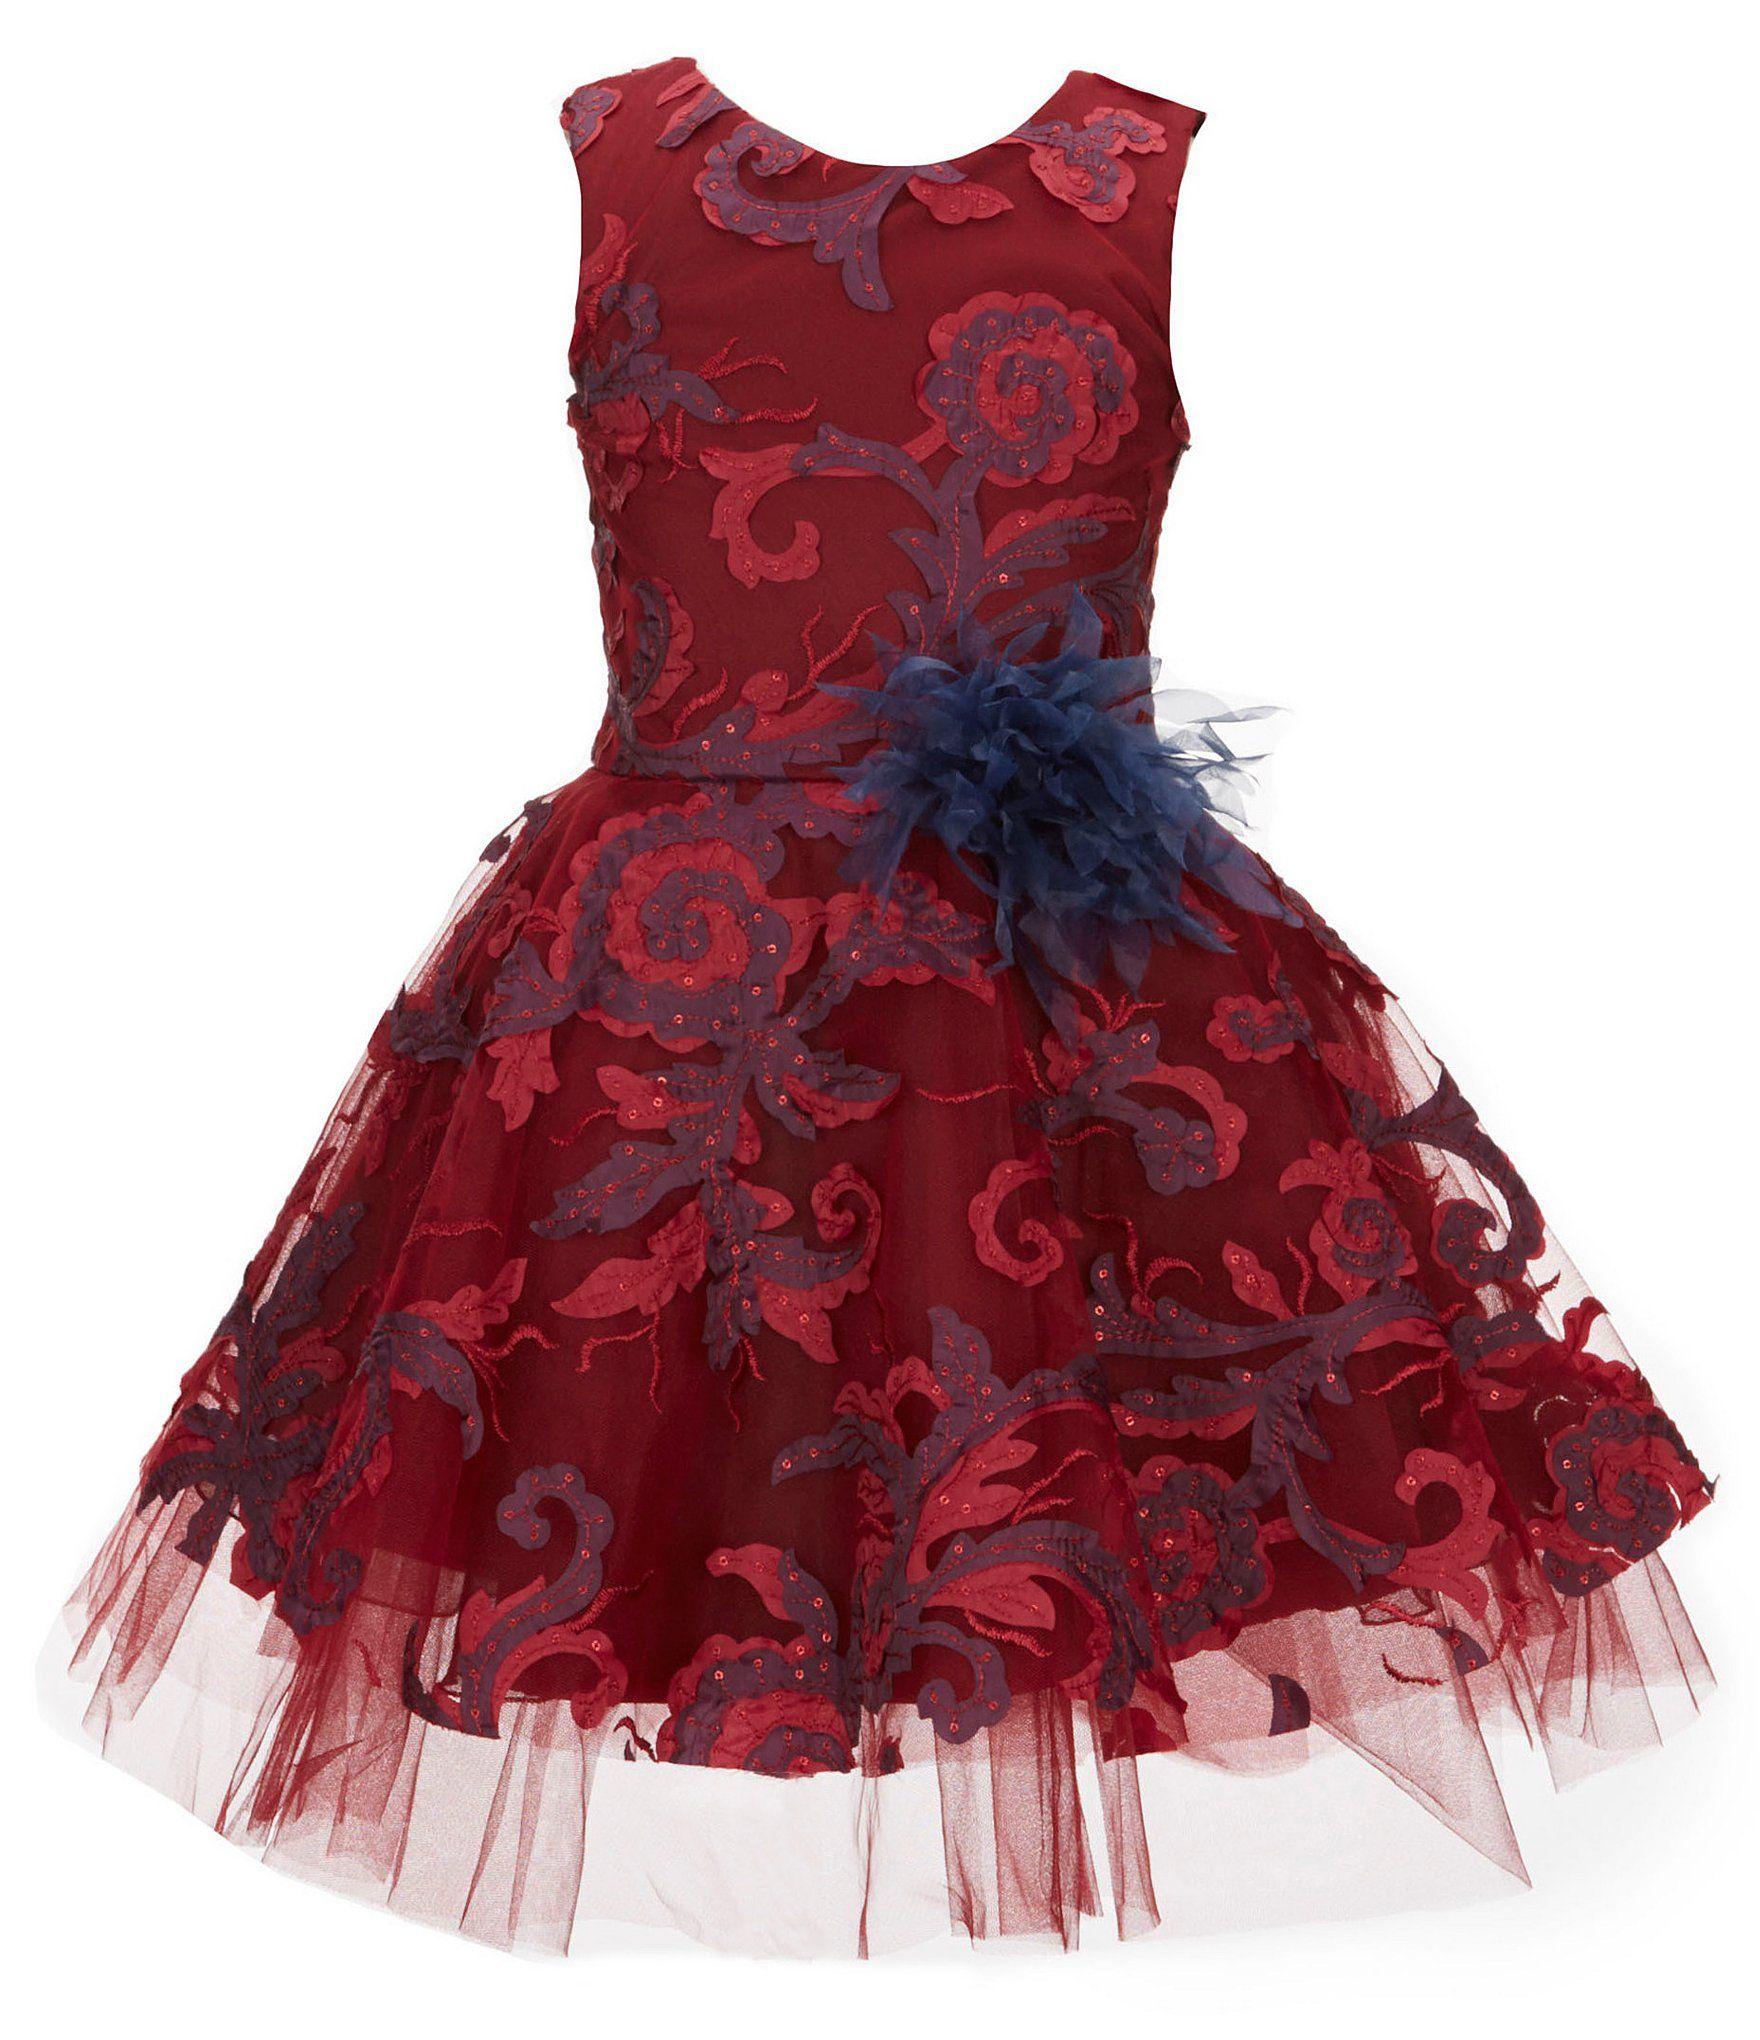 242a3af4c68 Zoe Big Girls 716 Ava Masquerade Ball Swirl Dress  Dillards